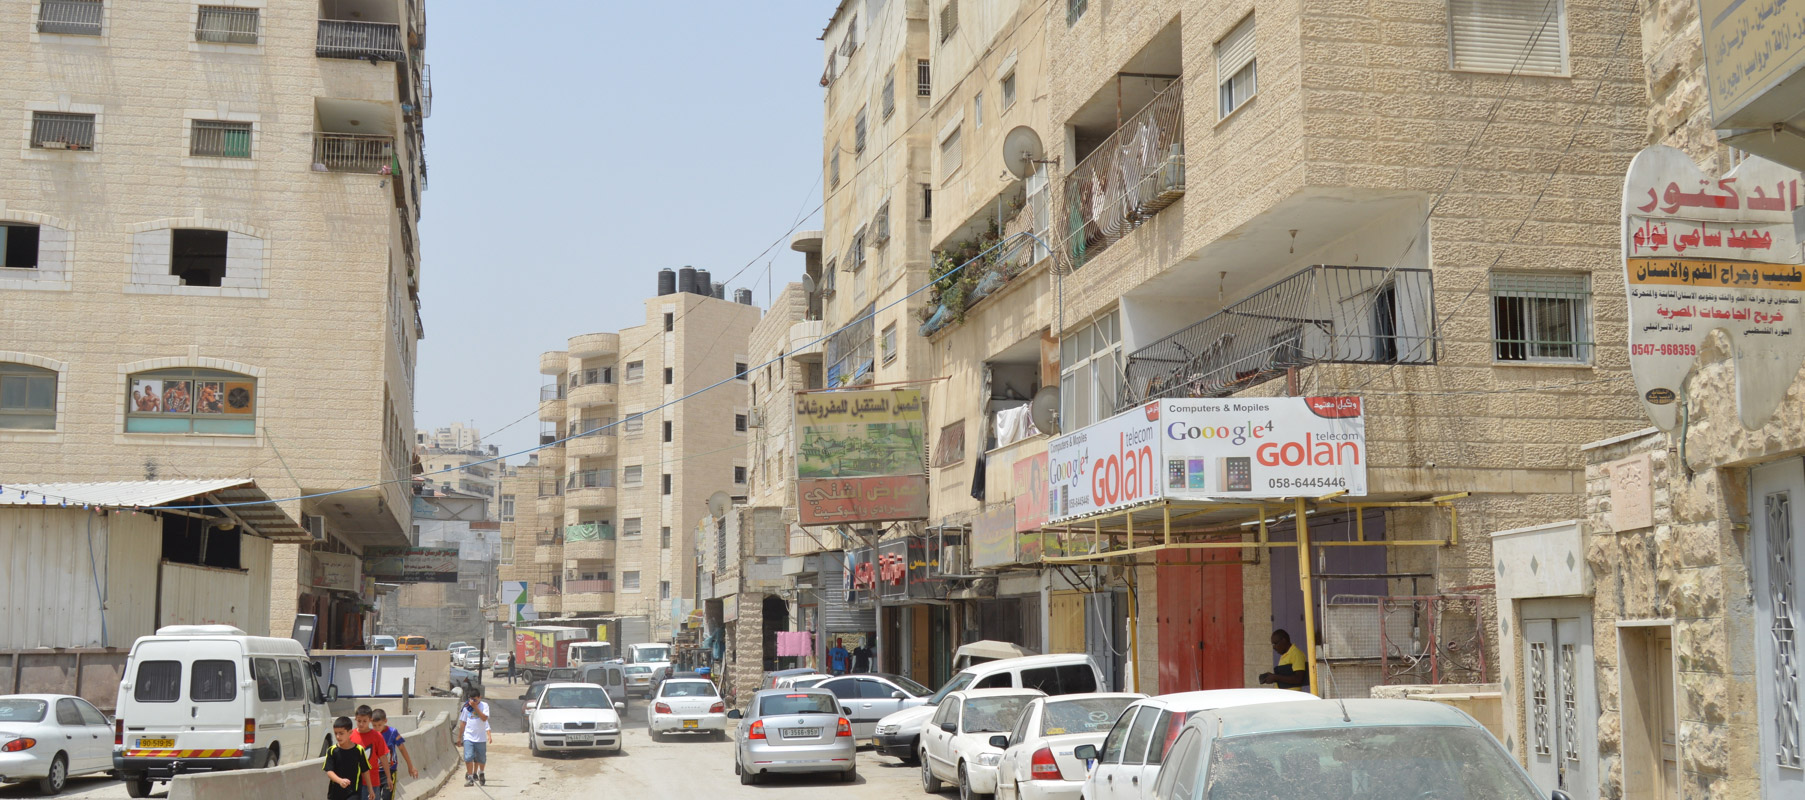 anata palestine